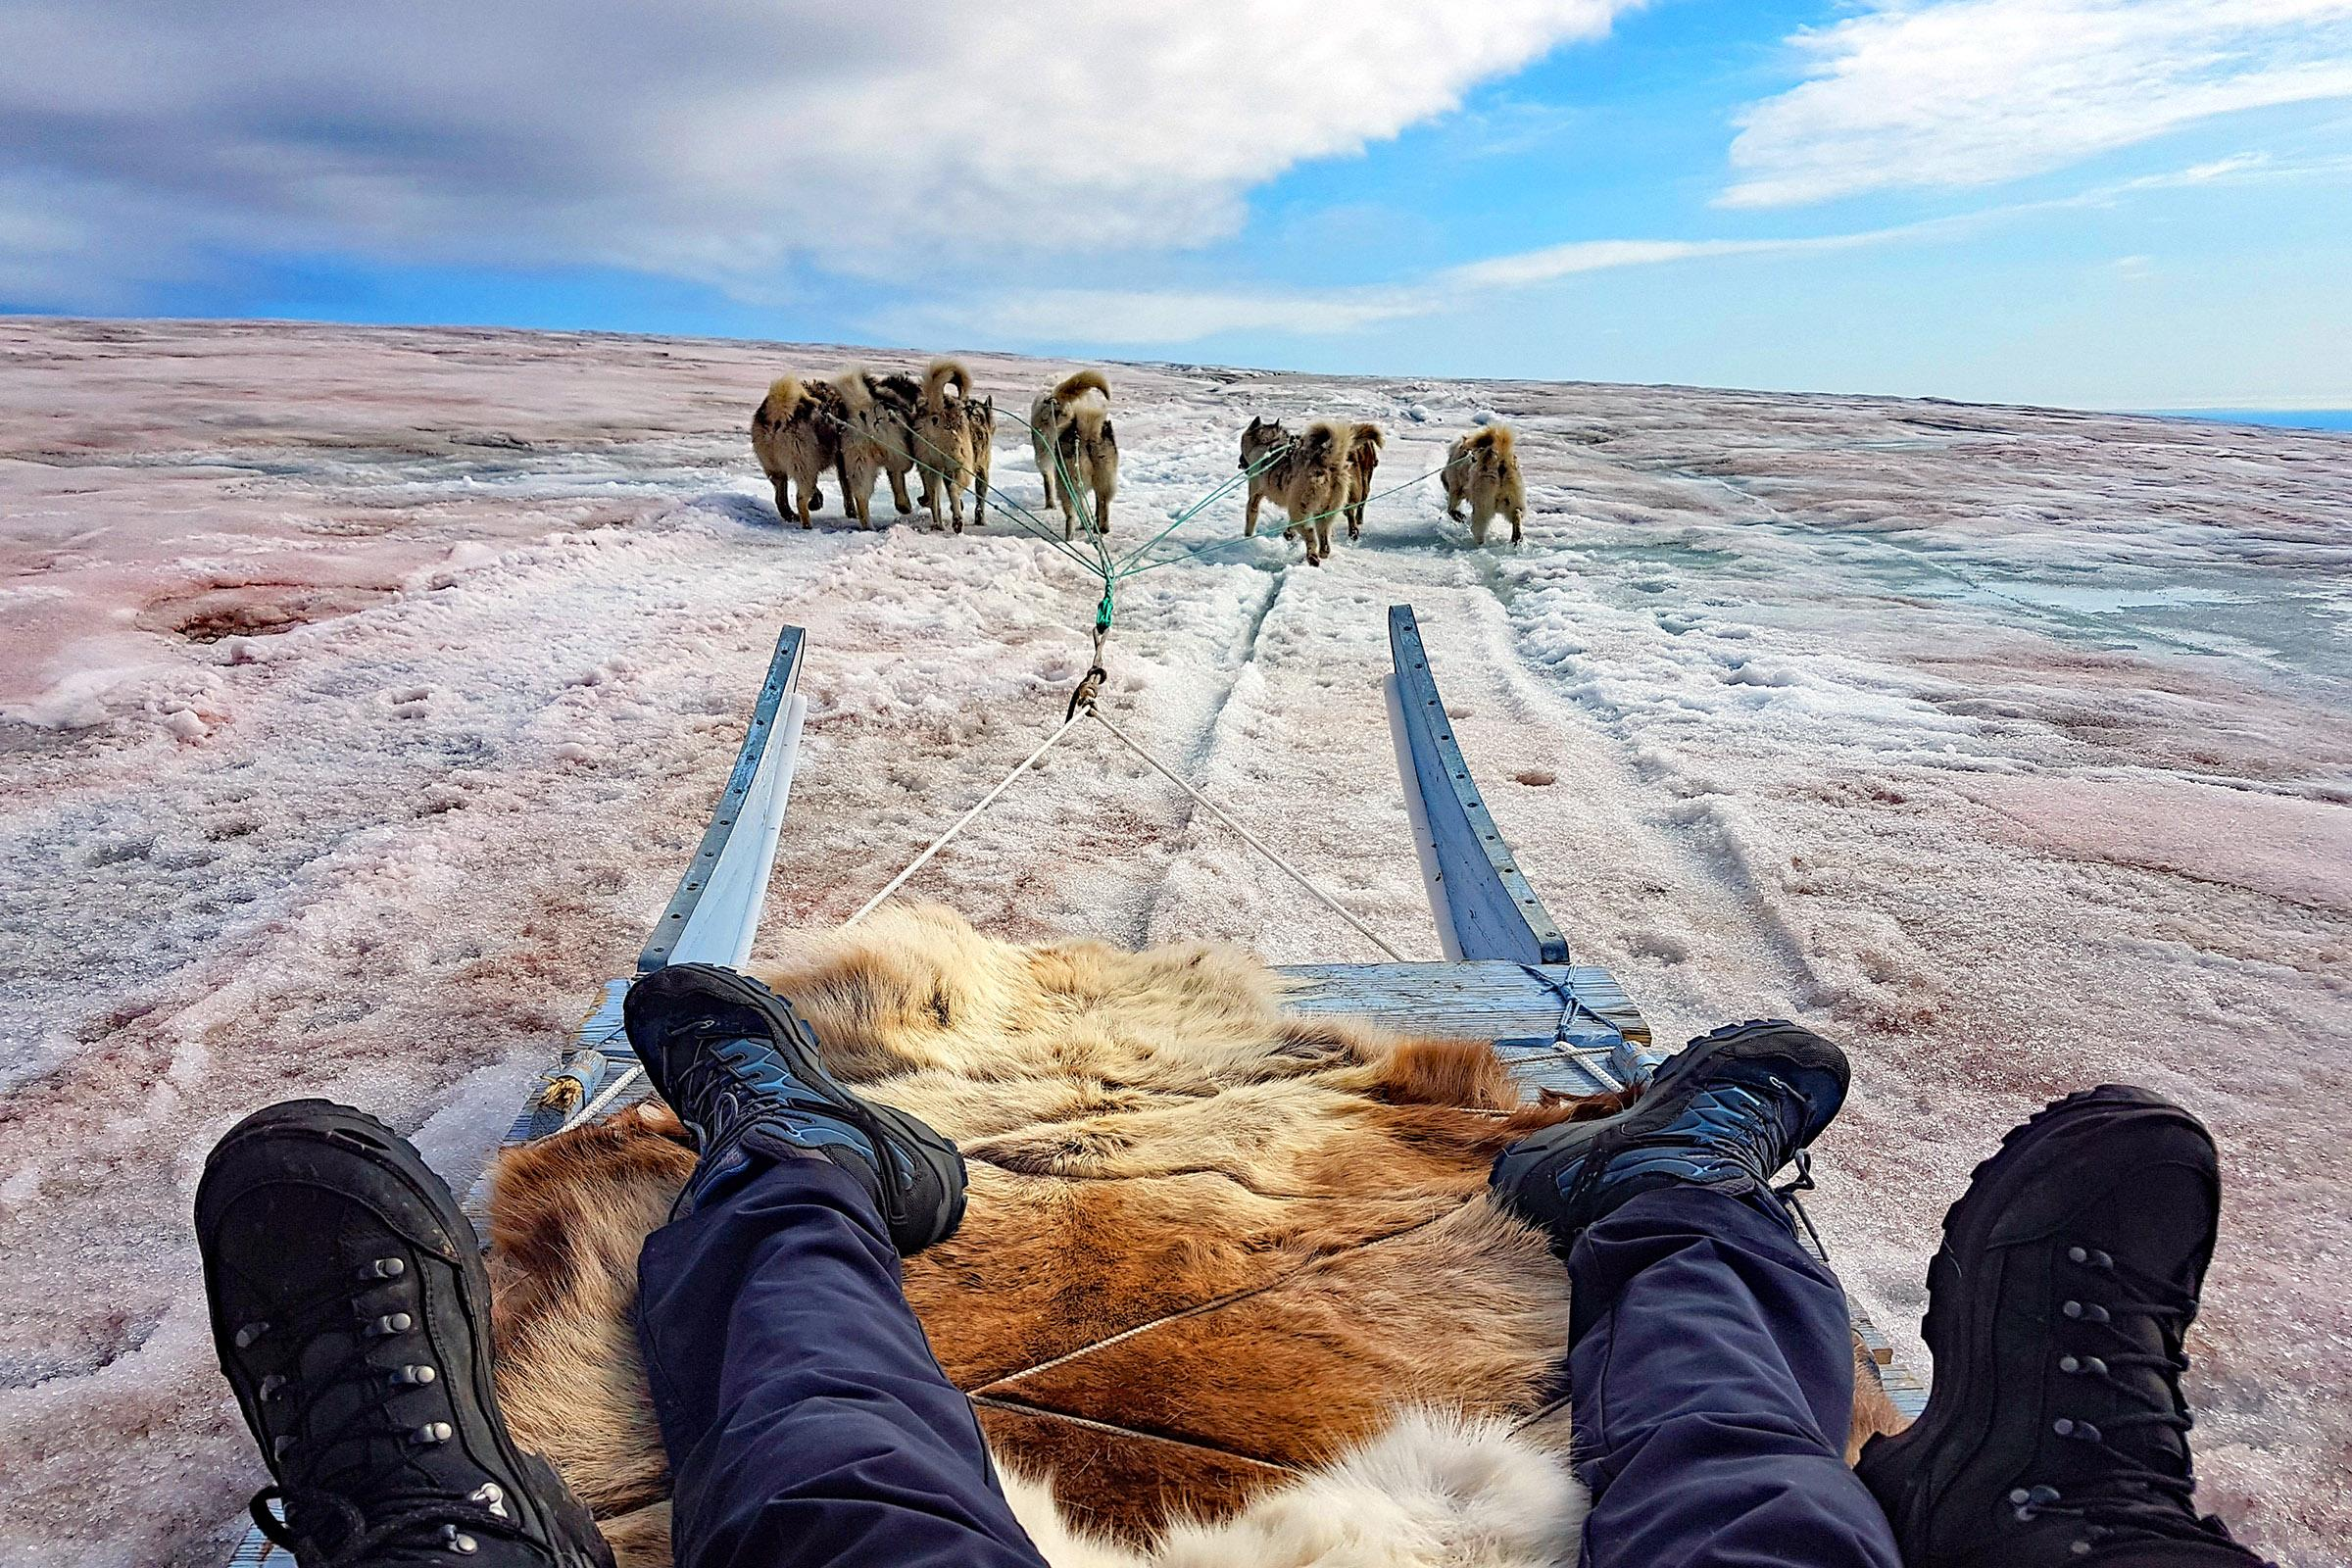 Husky sledding in Greenland with kids. Photo by Jurga Rubinovaite.